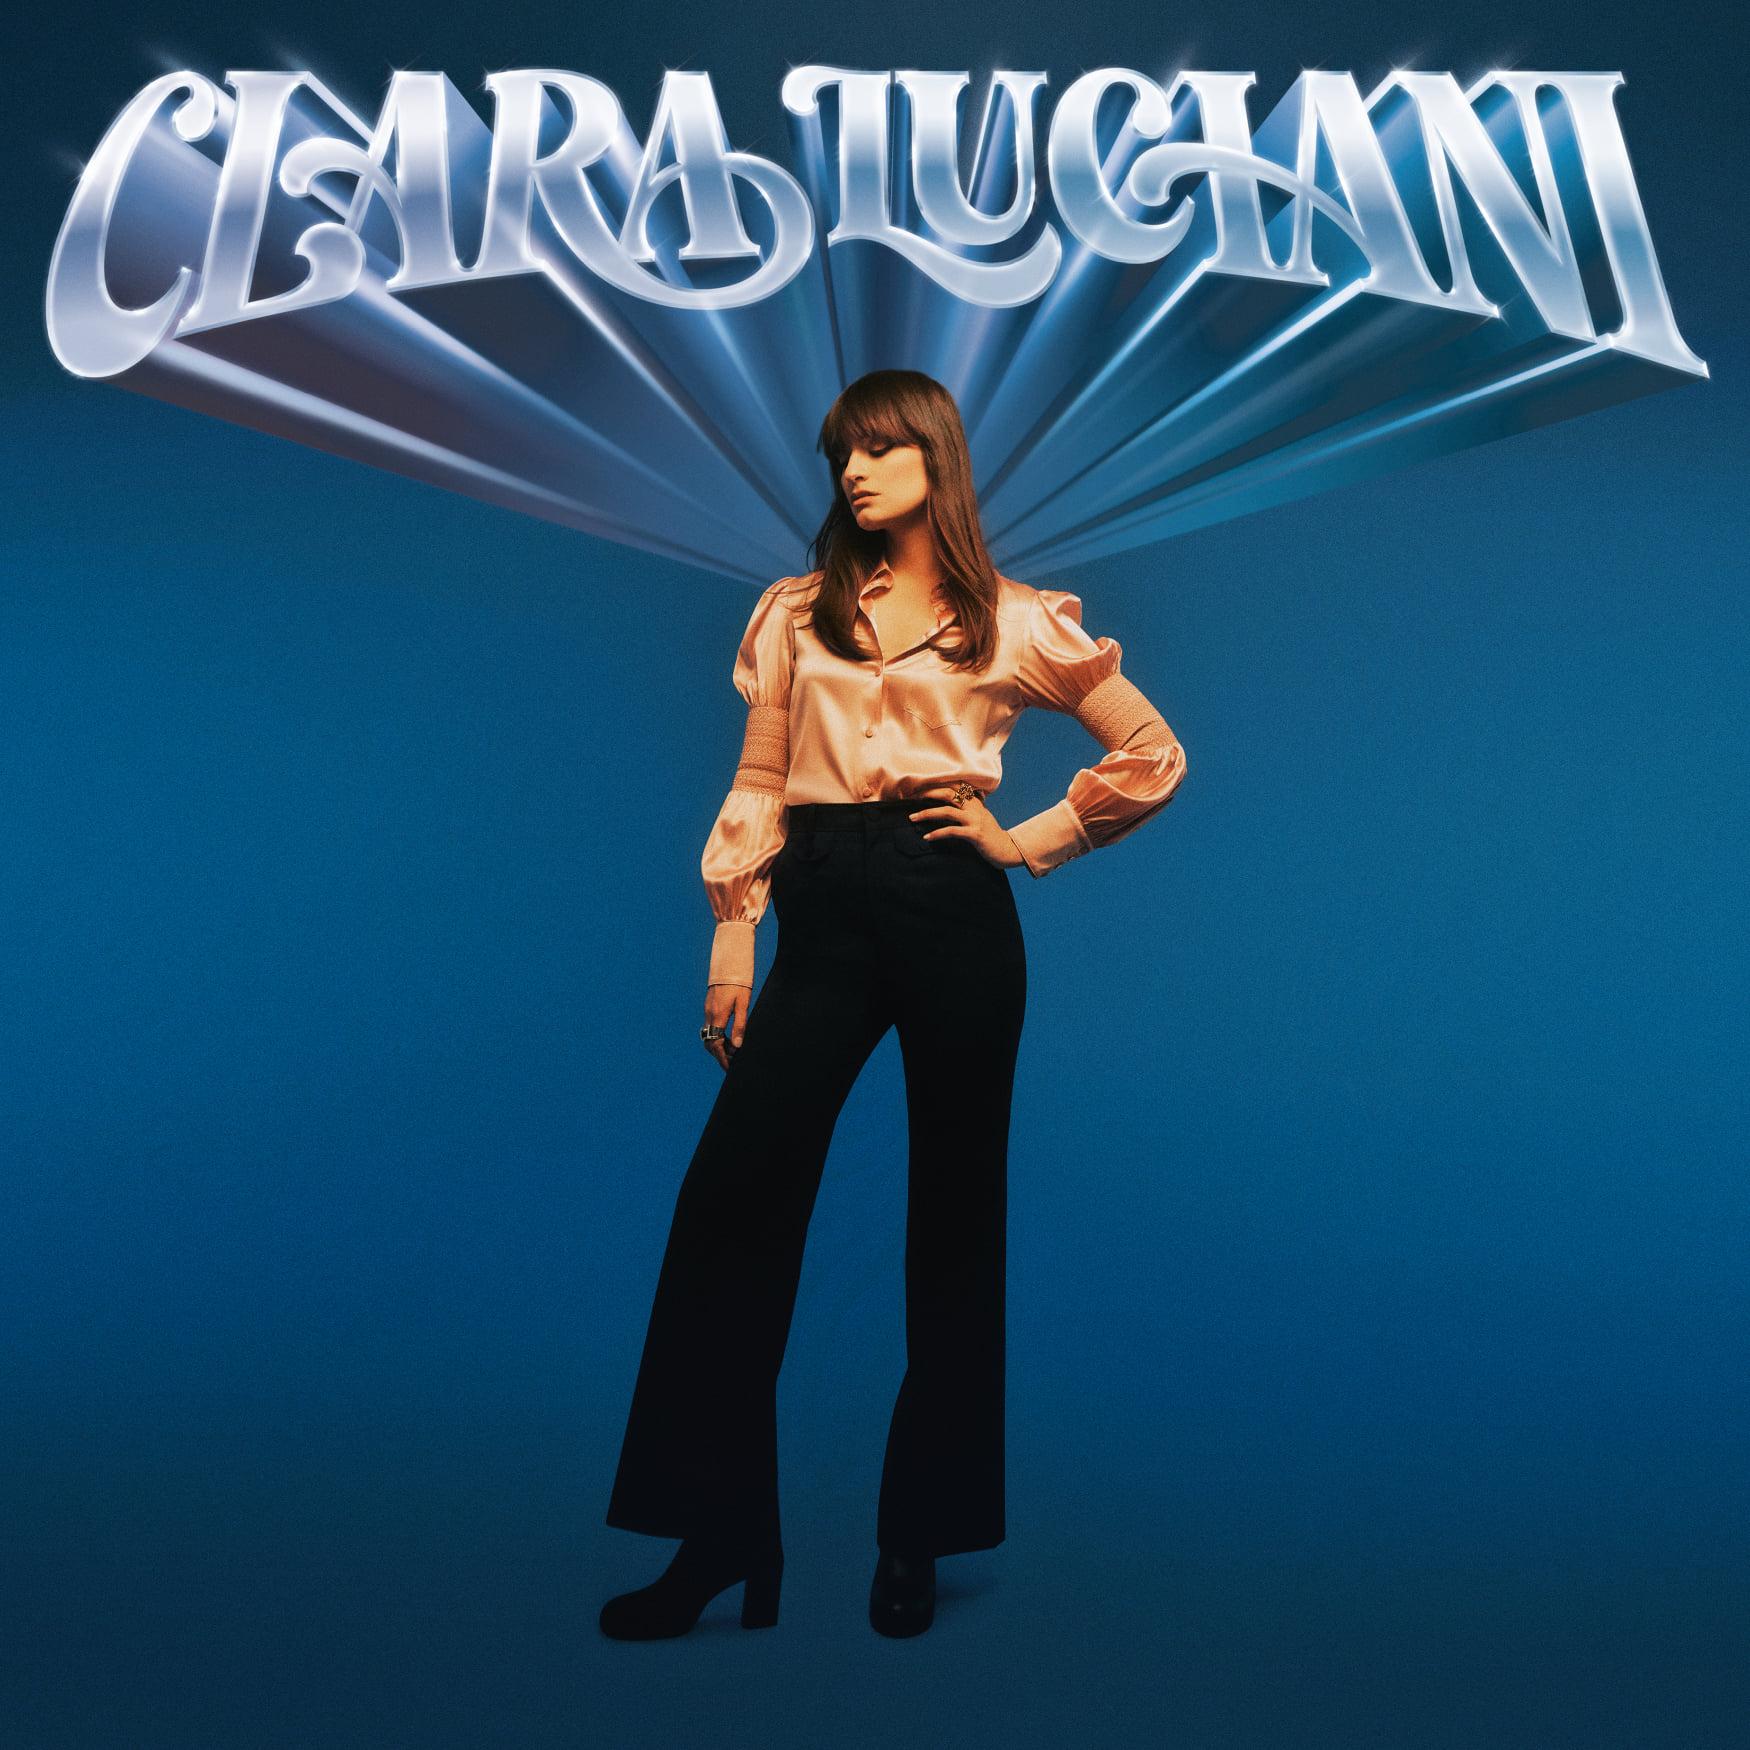 Clara Luciani - Coeur - deuxième album -